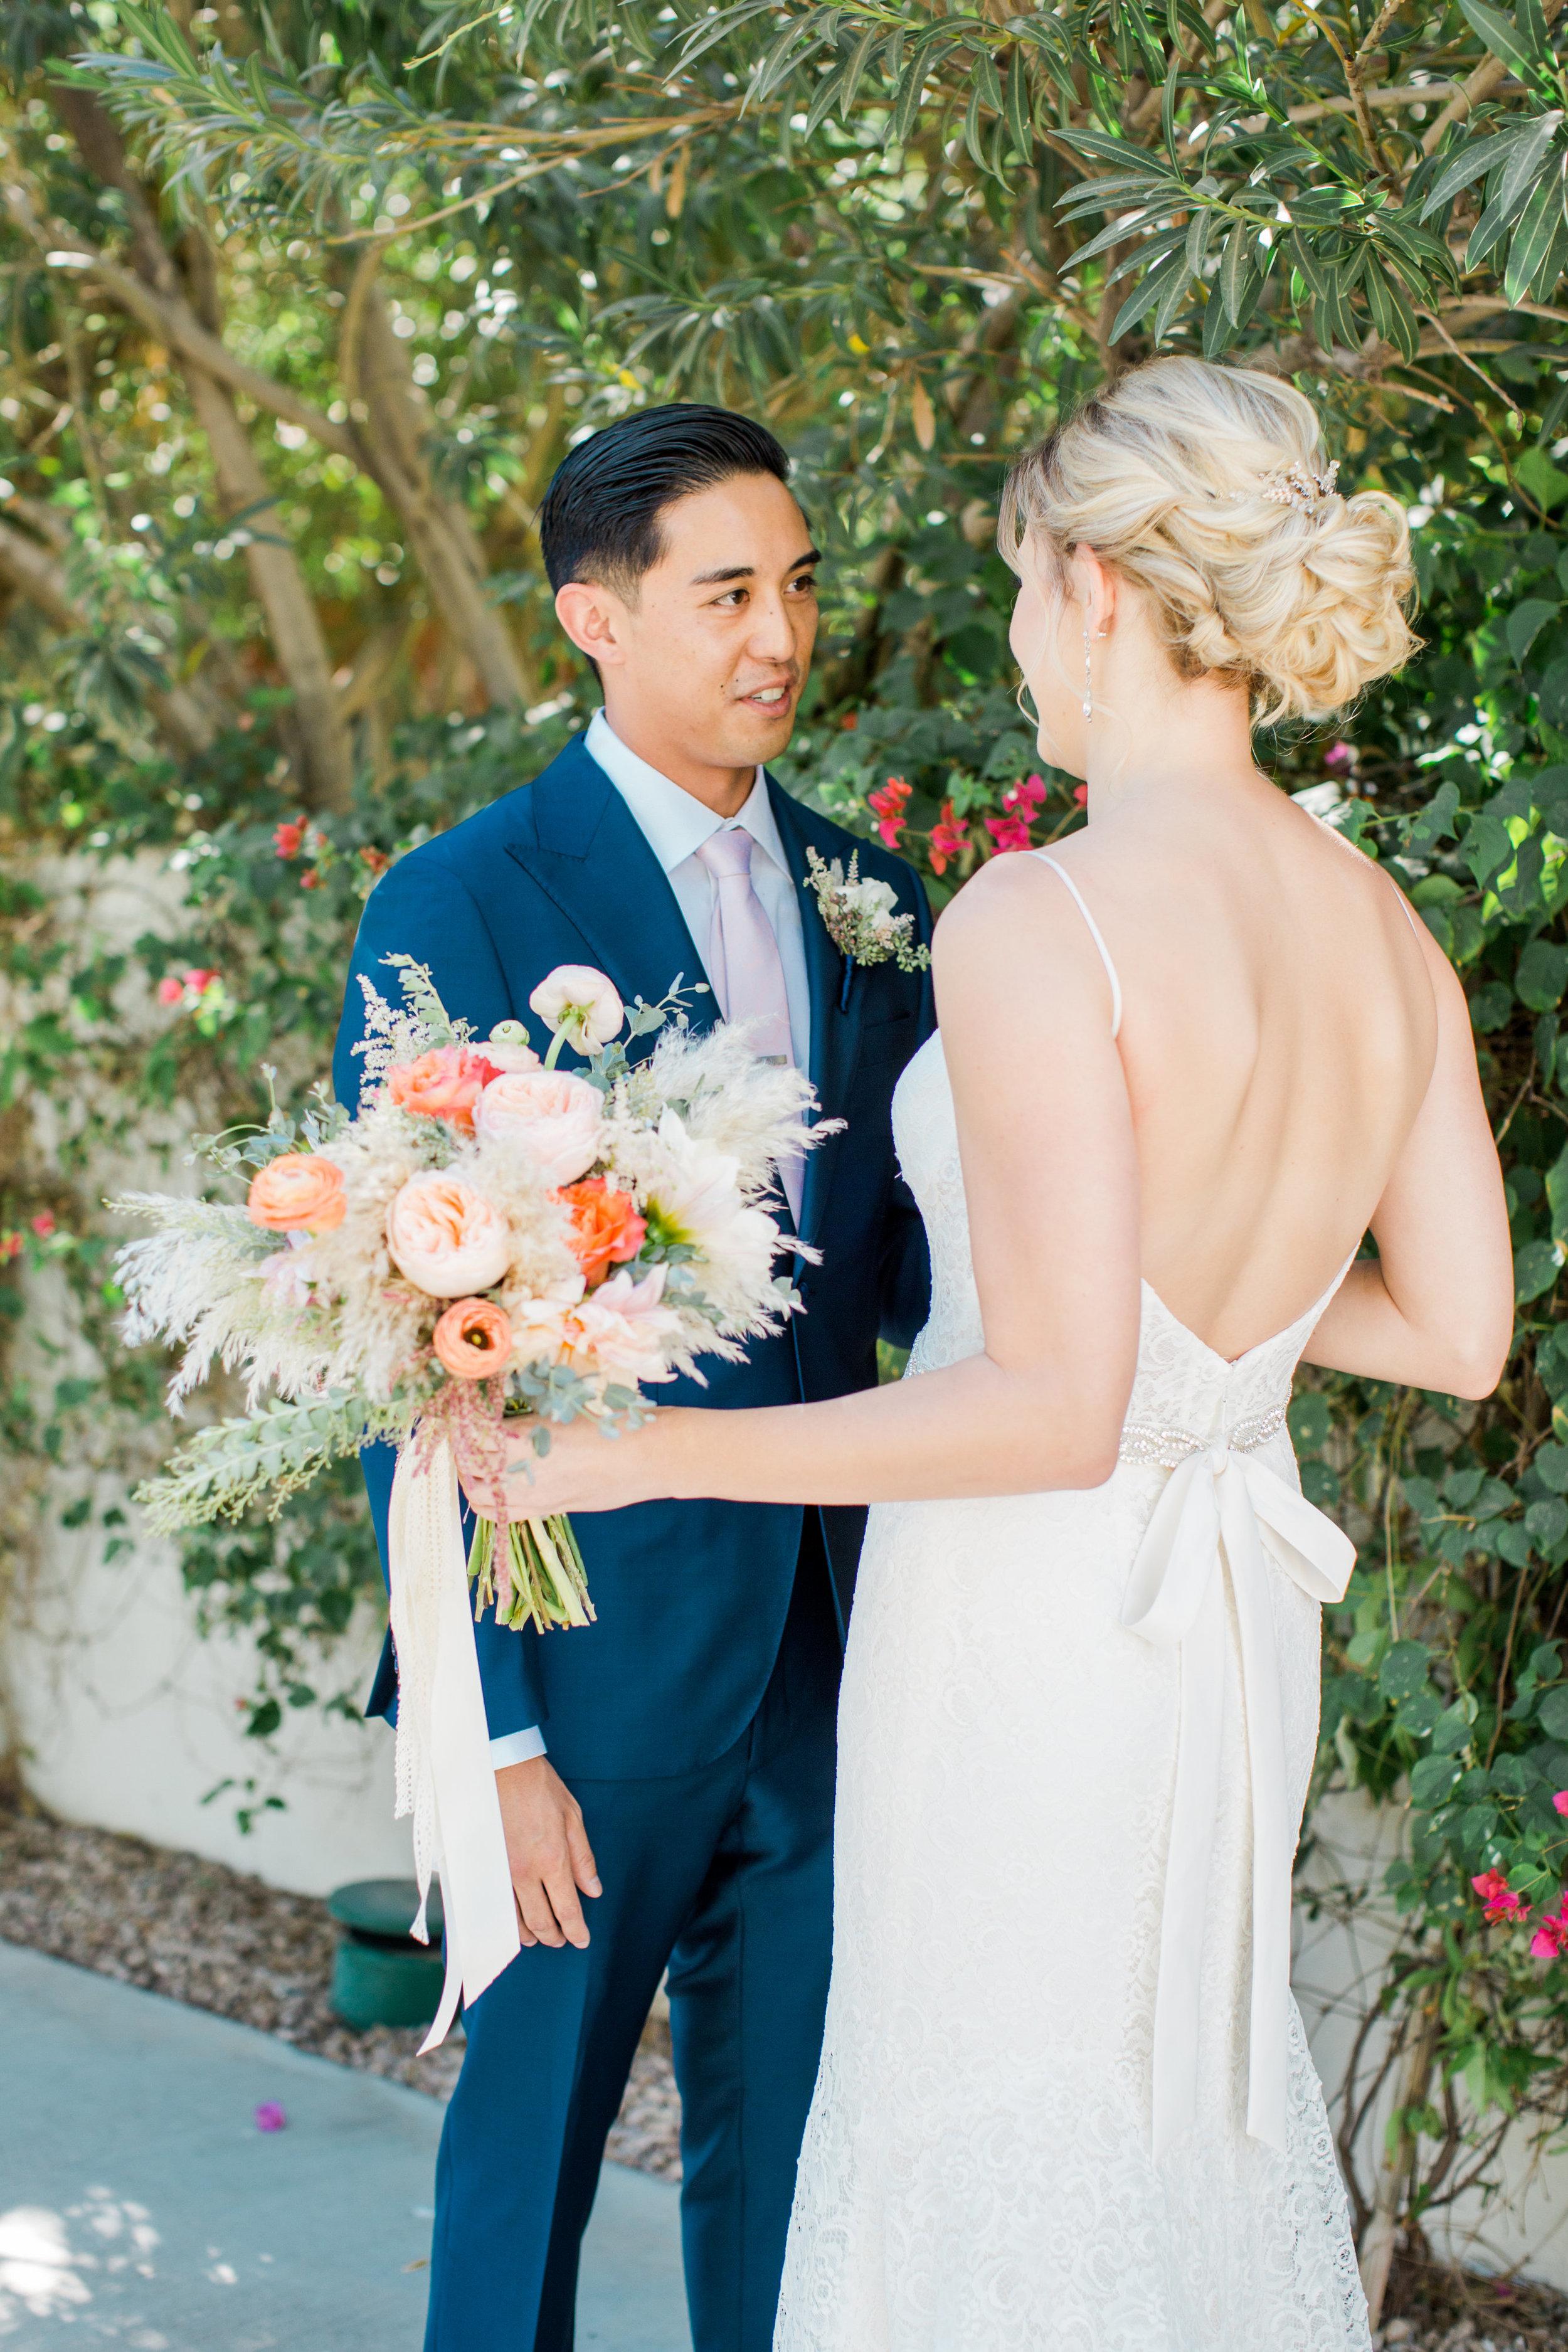 Modern BoHo Desert Garden Wedding Featured on GreyLikes Weddings: Jocelyn & Tommy- Konsider It Done- AZ Arizona Wedding & Event Planner, Designer, Coordinator Planning in Scottsdale, Phoenix, Paradise Valley, Tempe, Gilbert, Mesa, Chandler, Tucson, Sedona